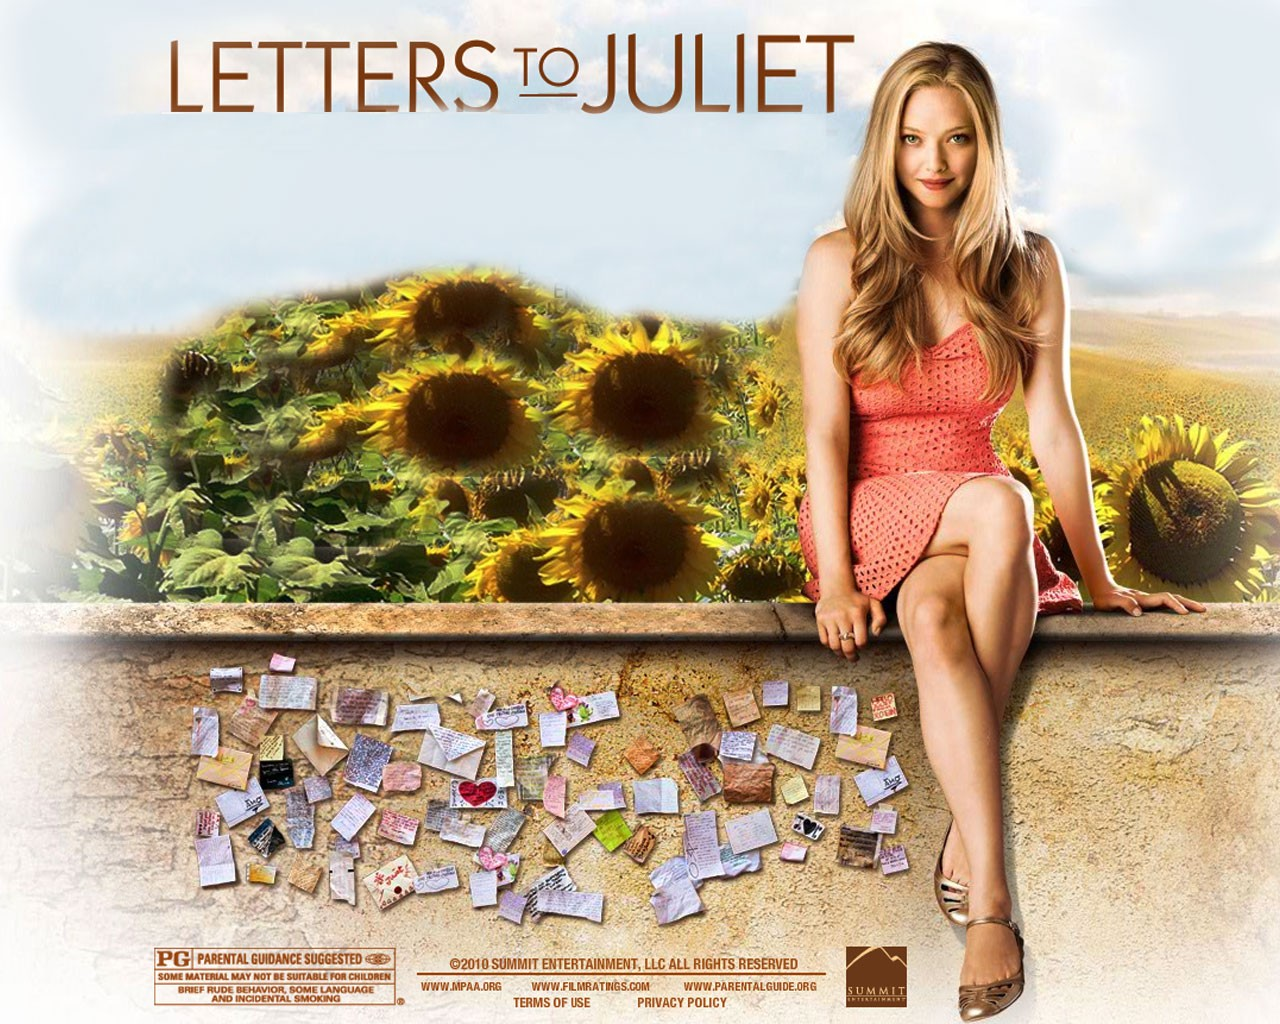 http://3.bp.blogspot.com/-zJeoft0xVP8/T0jNPSlZupI/AAAAAAAAA4Q/cwSzuRYSj6A/s1600/letters-to-juliet-wallpaper-1.jpg